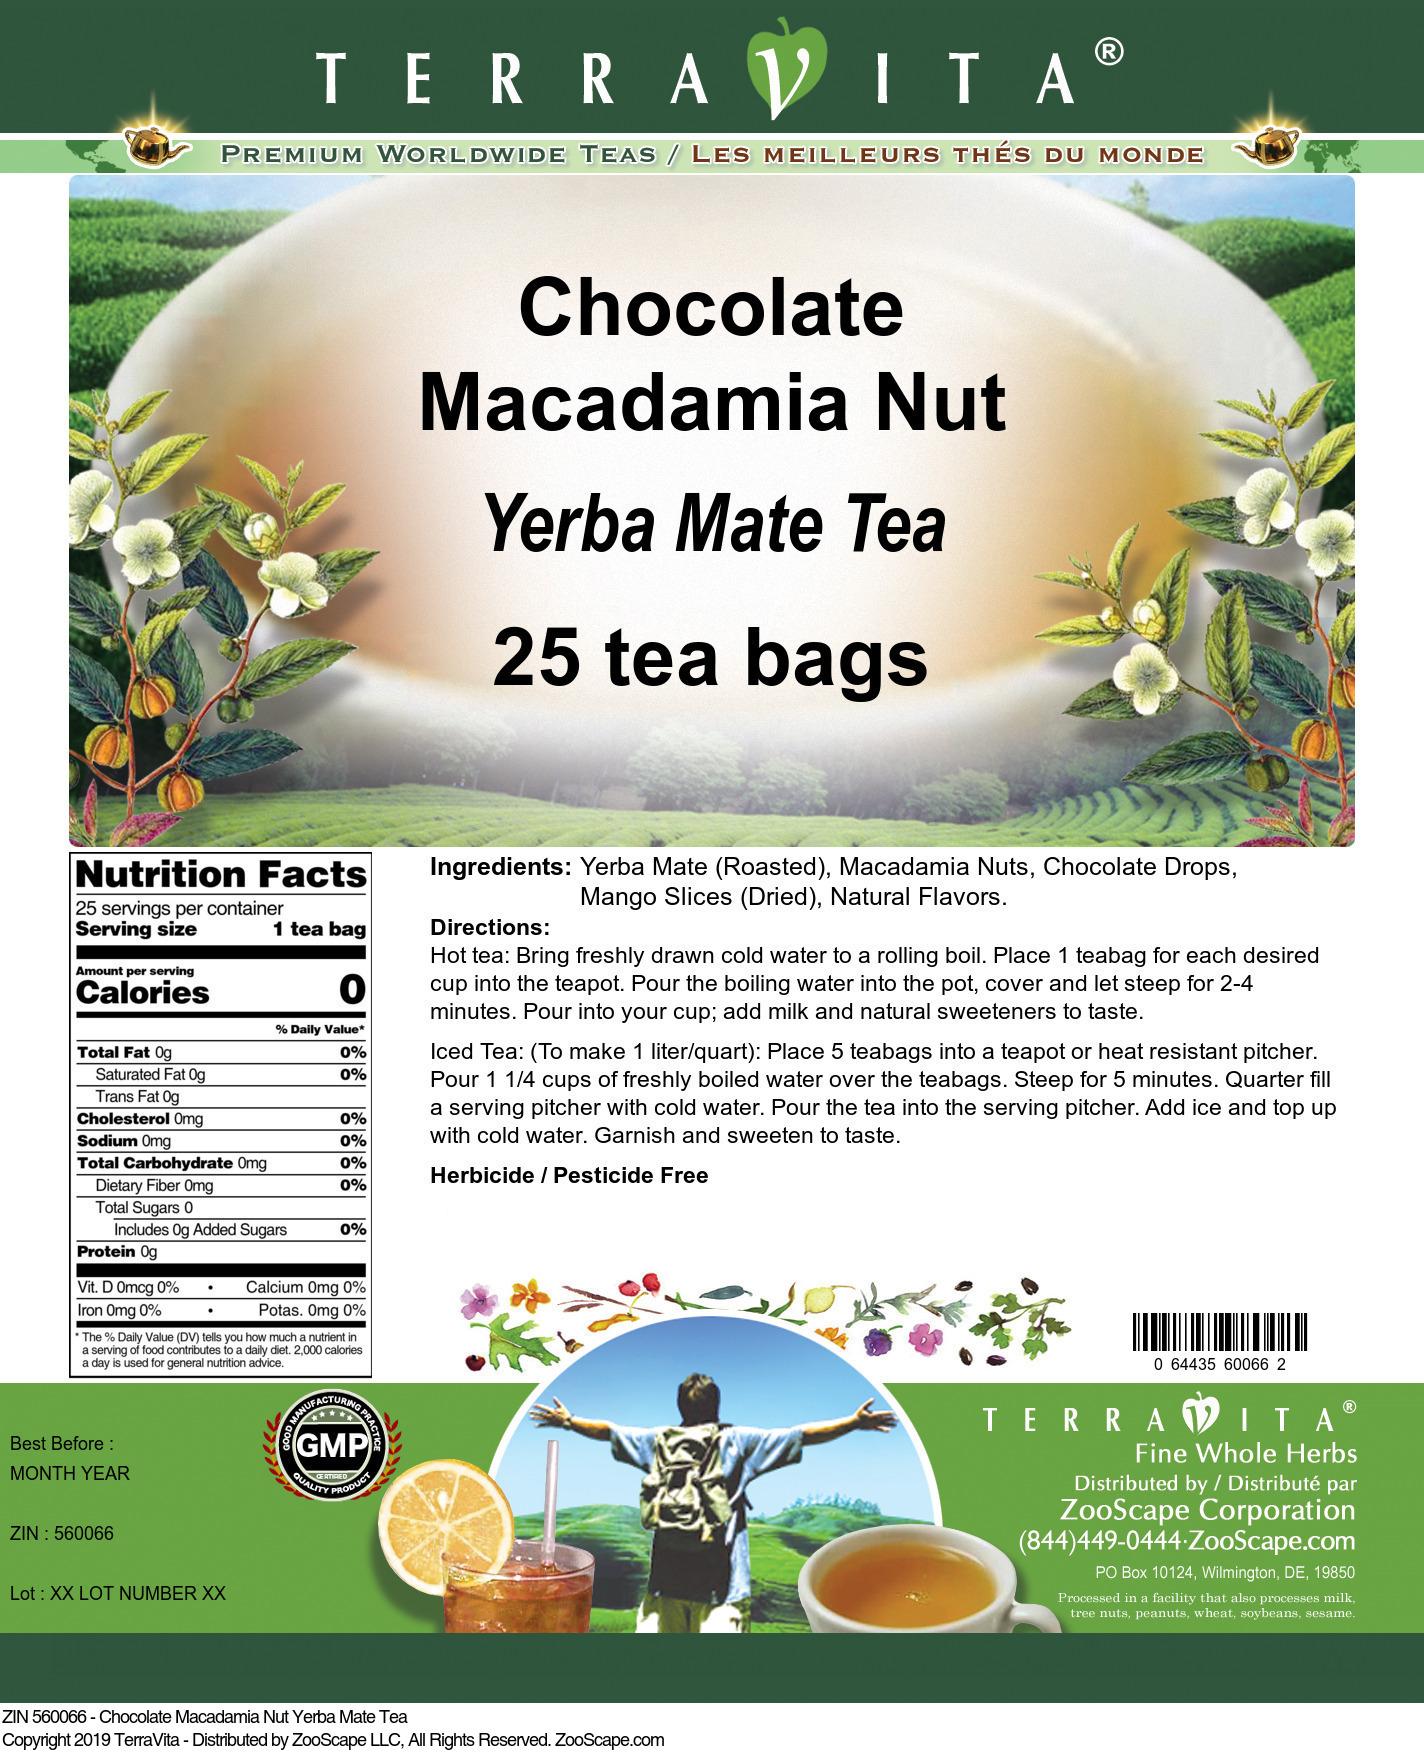 Chocolate Macadamia Nut Yerba Mate Tea